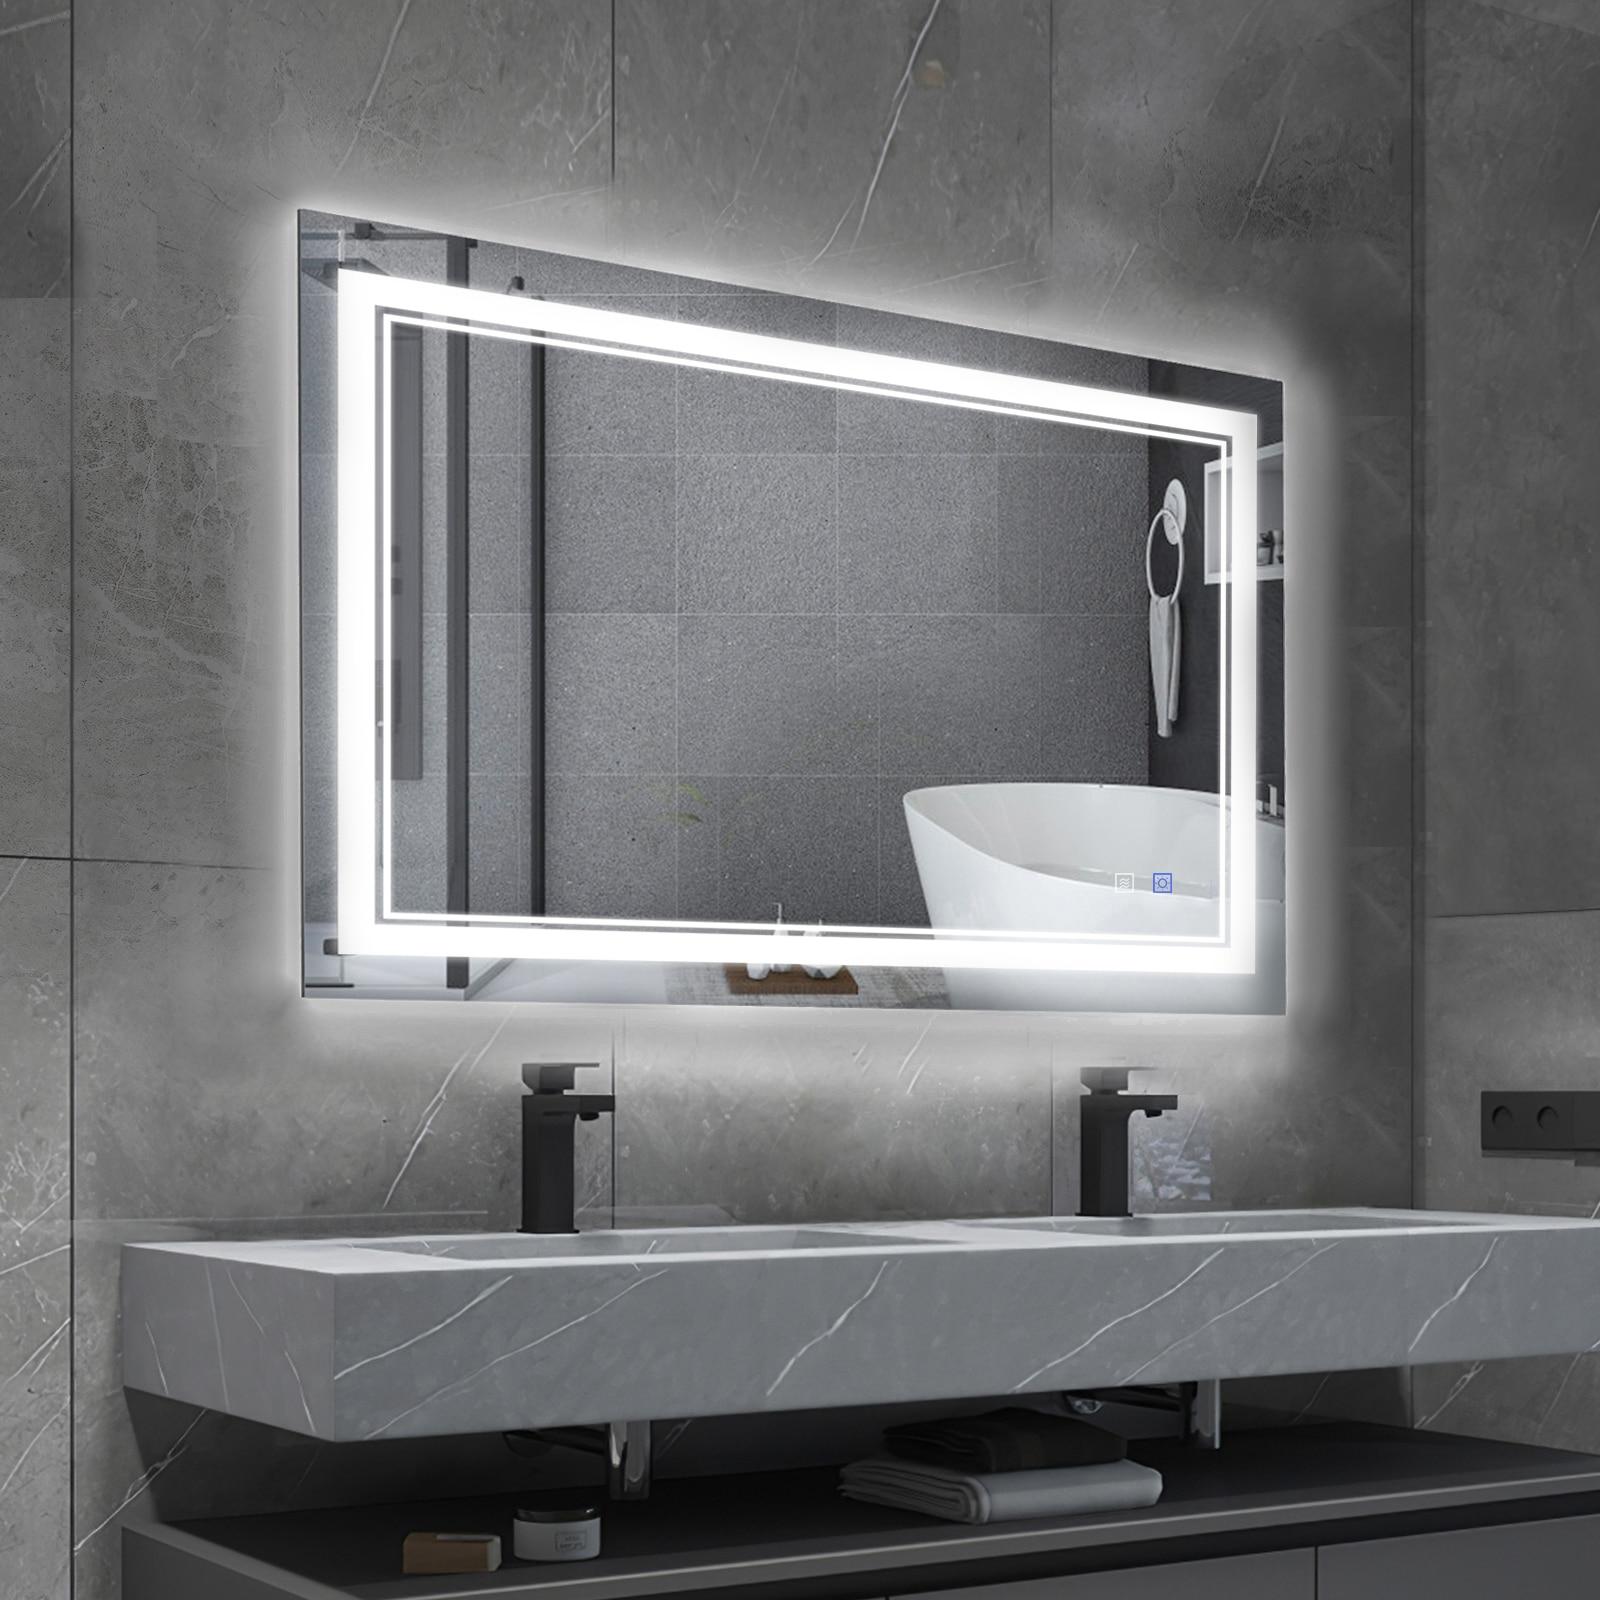 BBE Bath Mirror Smart Mirror LED Bathroom Mirror Dimmable Backlight Anti-fog Wall-mounted Makeup Mirror 32x24 inch